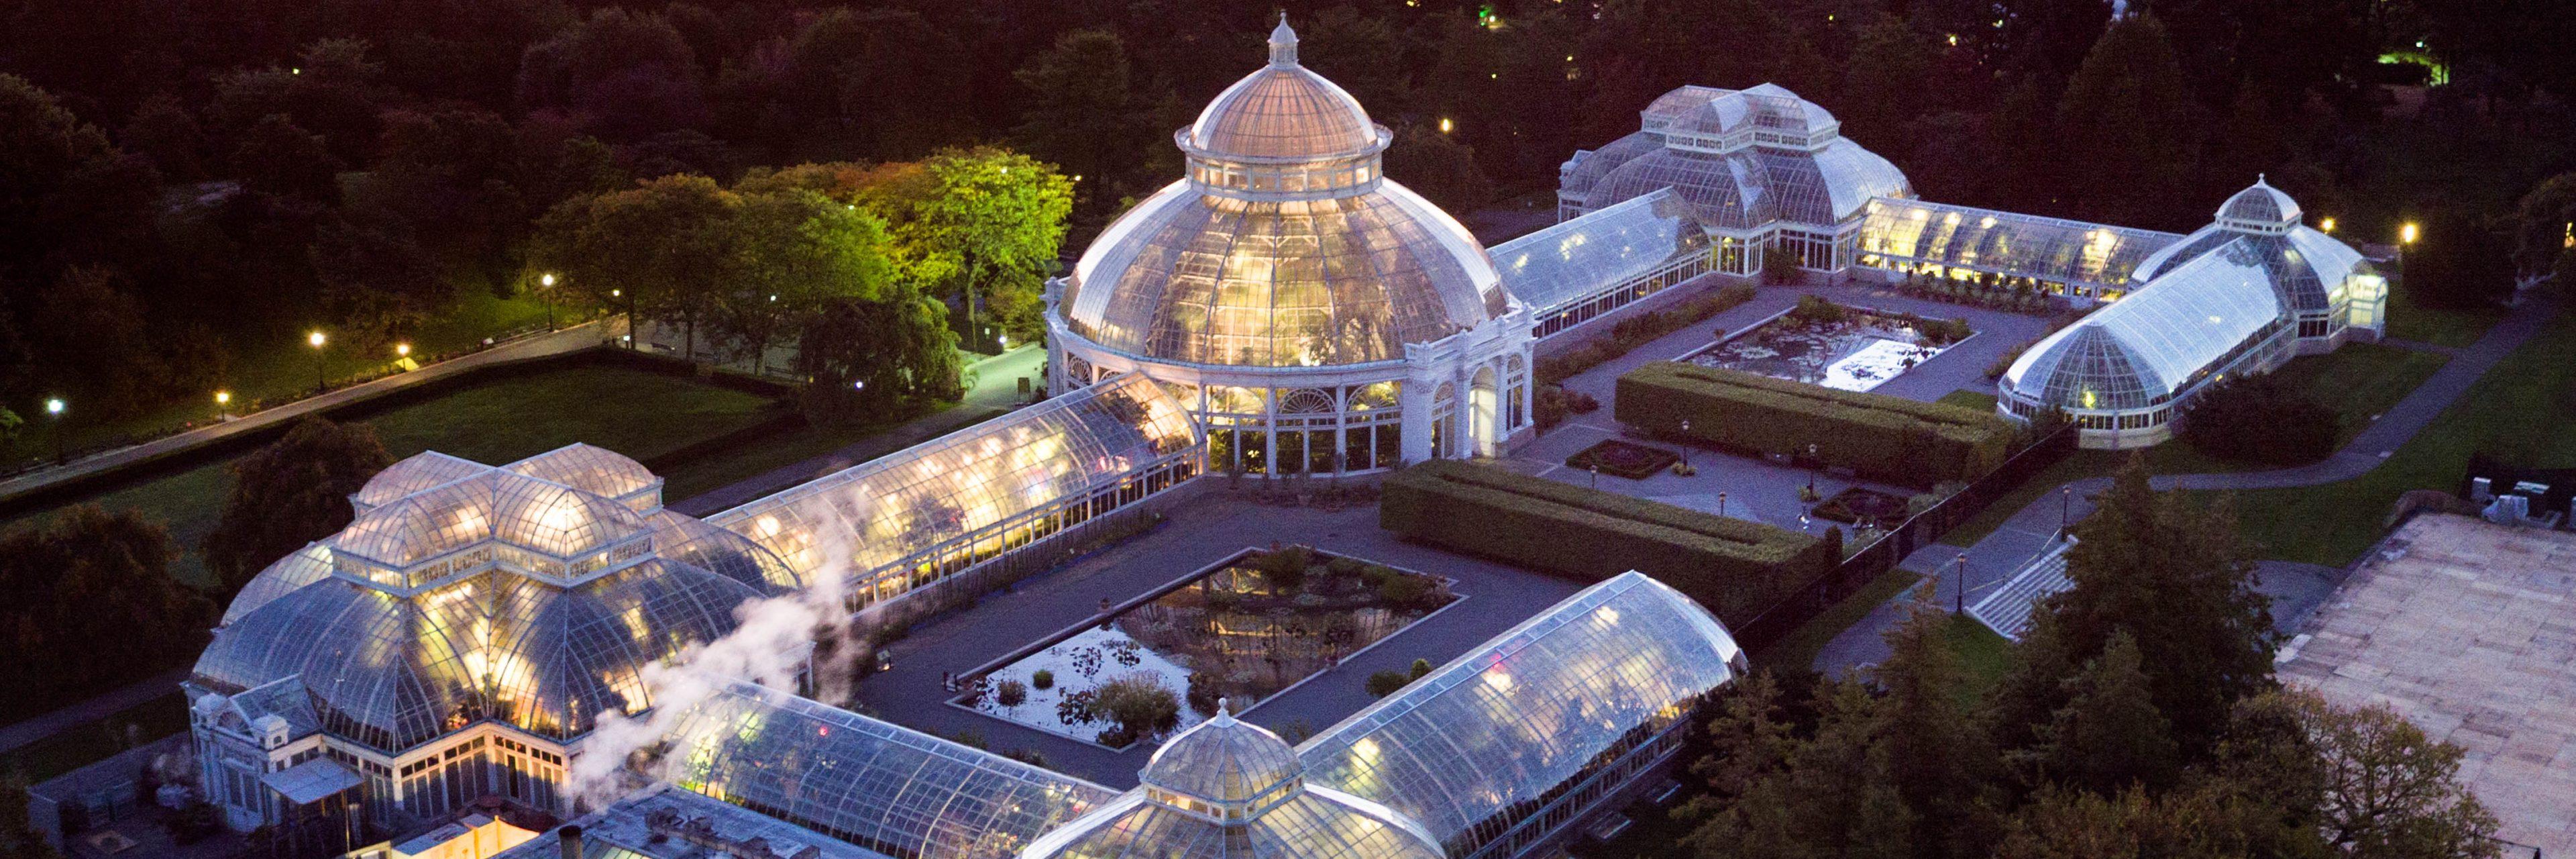 bronx wedding venues botanical gardens